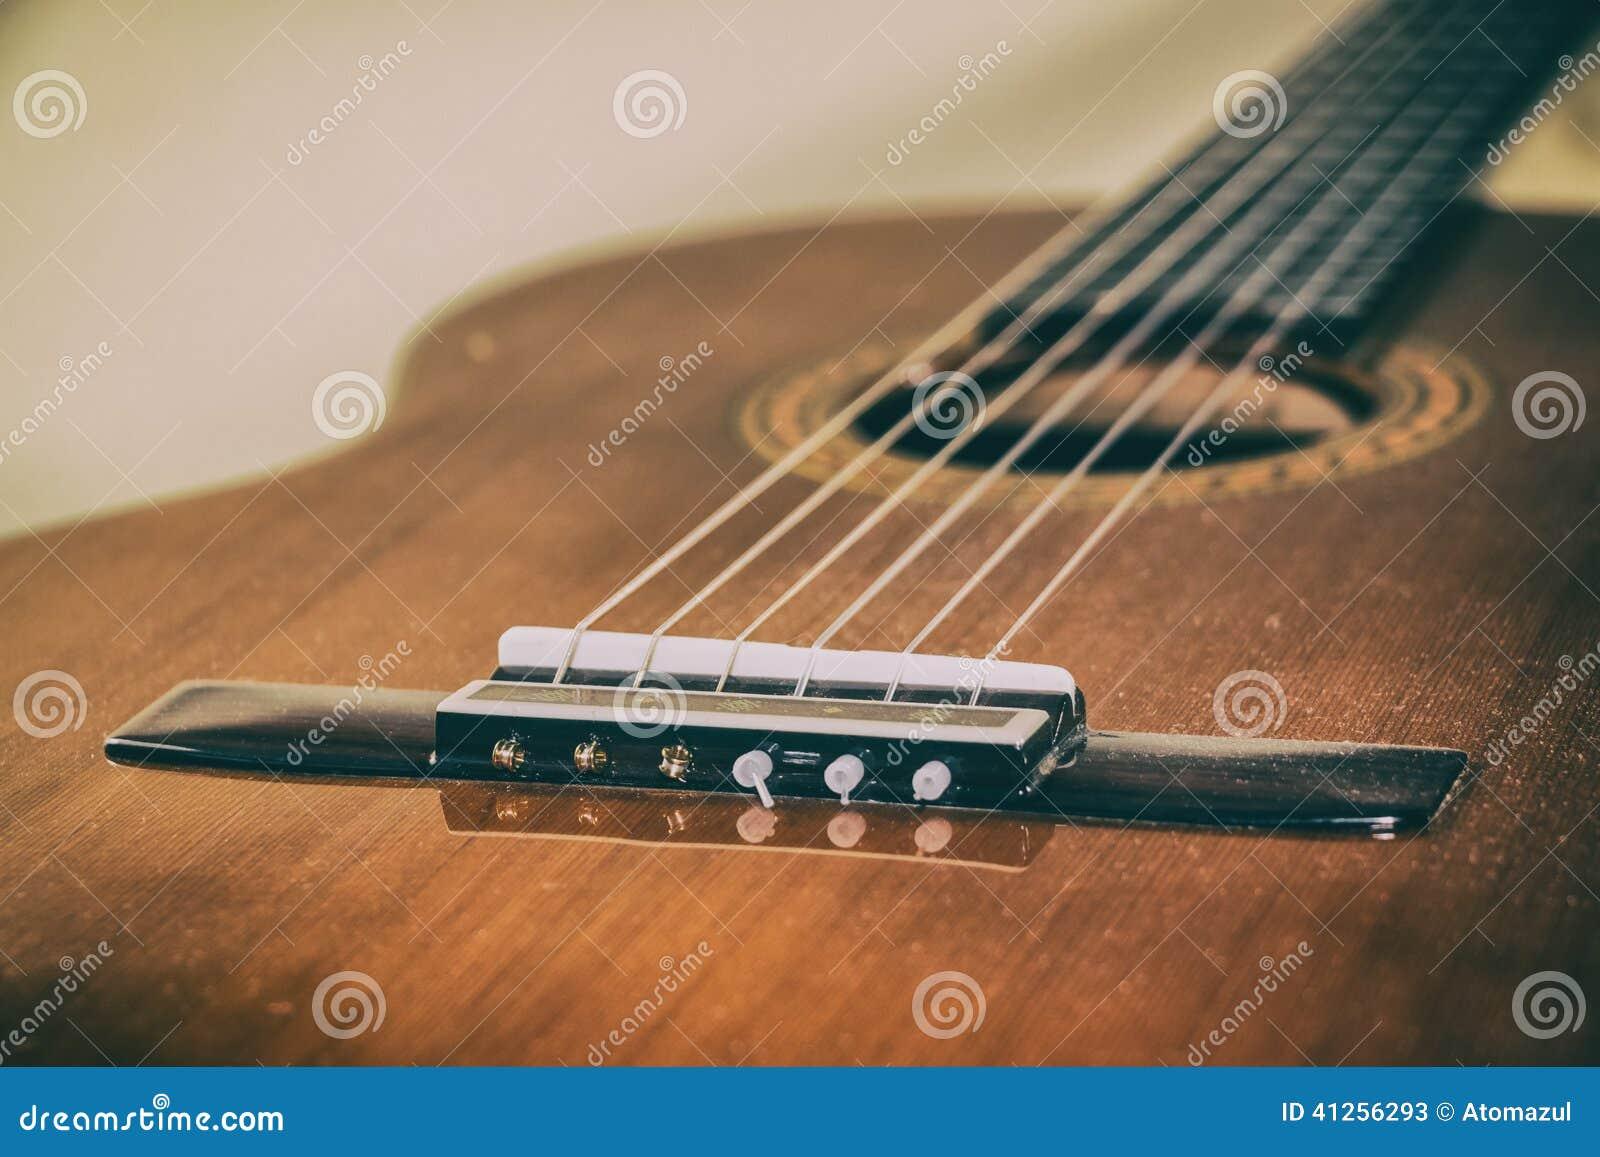 classical guitar bridge stock image image of acoustic 41256293. Black Bedroom Furniture Sets. Home Design Ideas